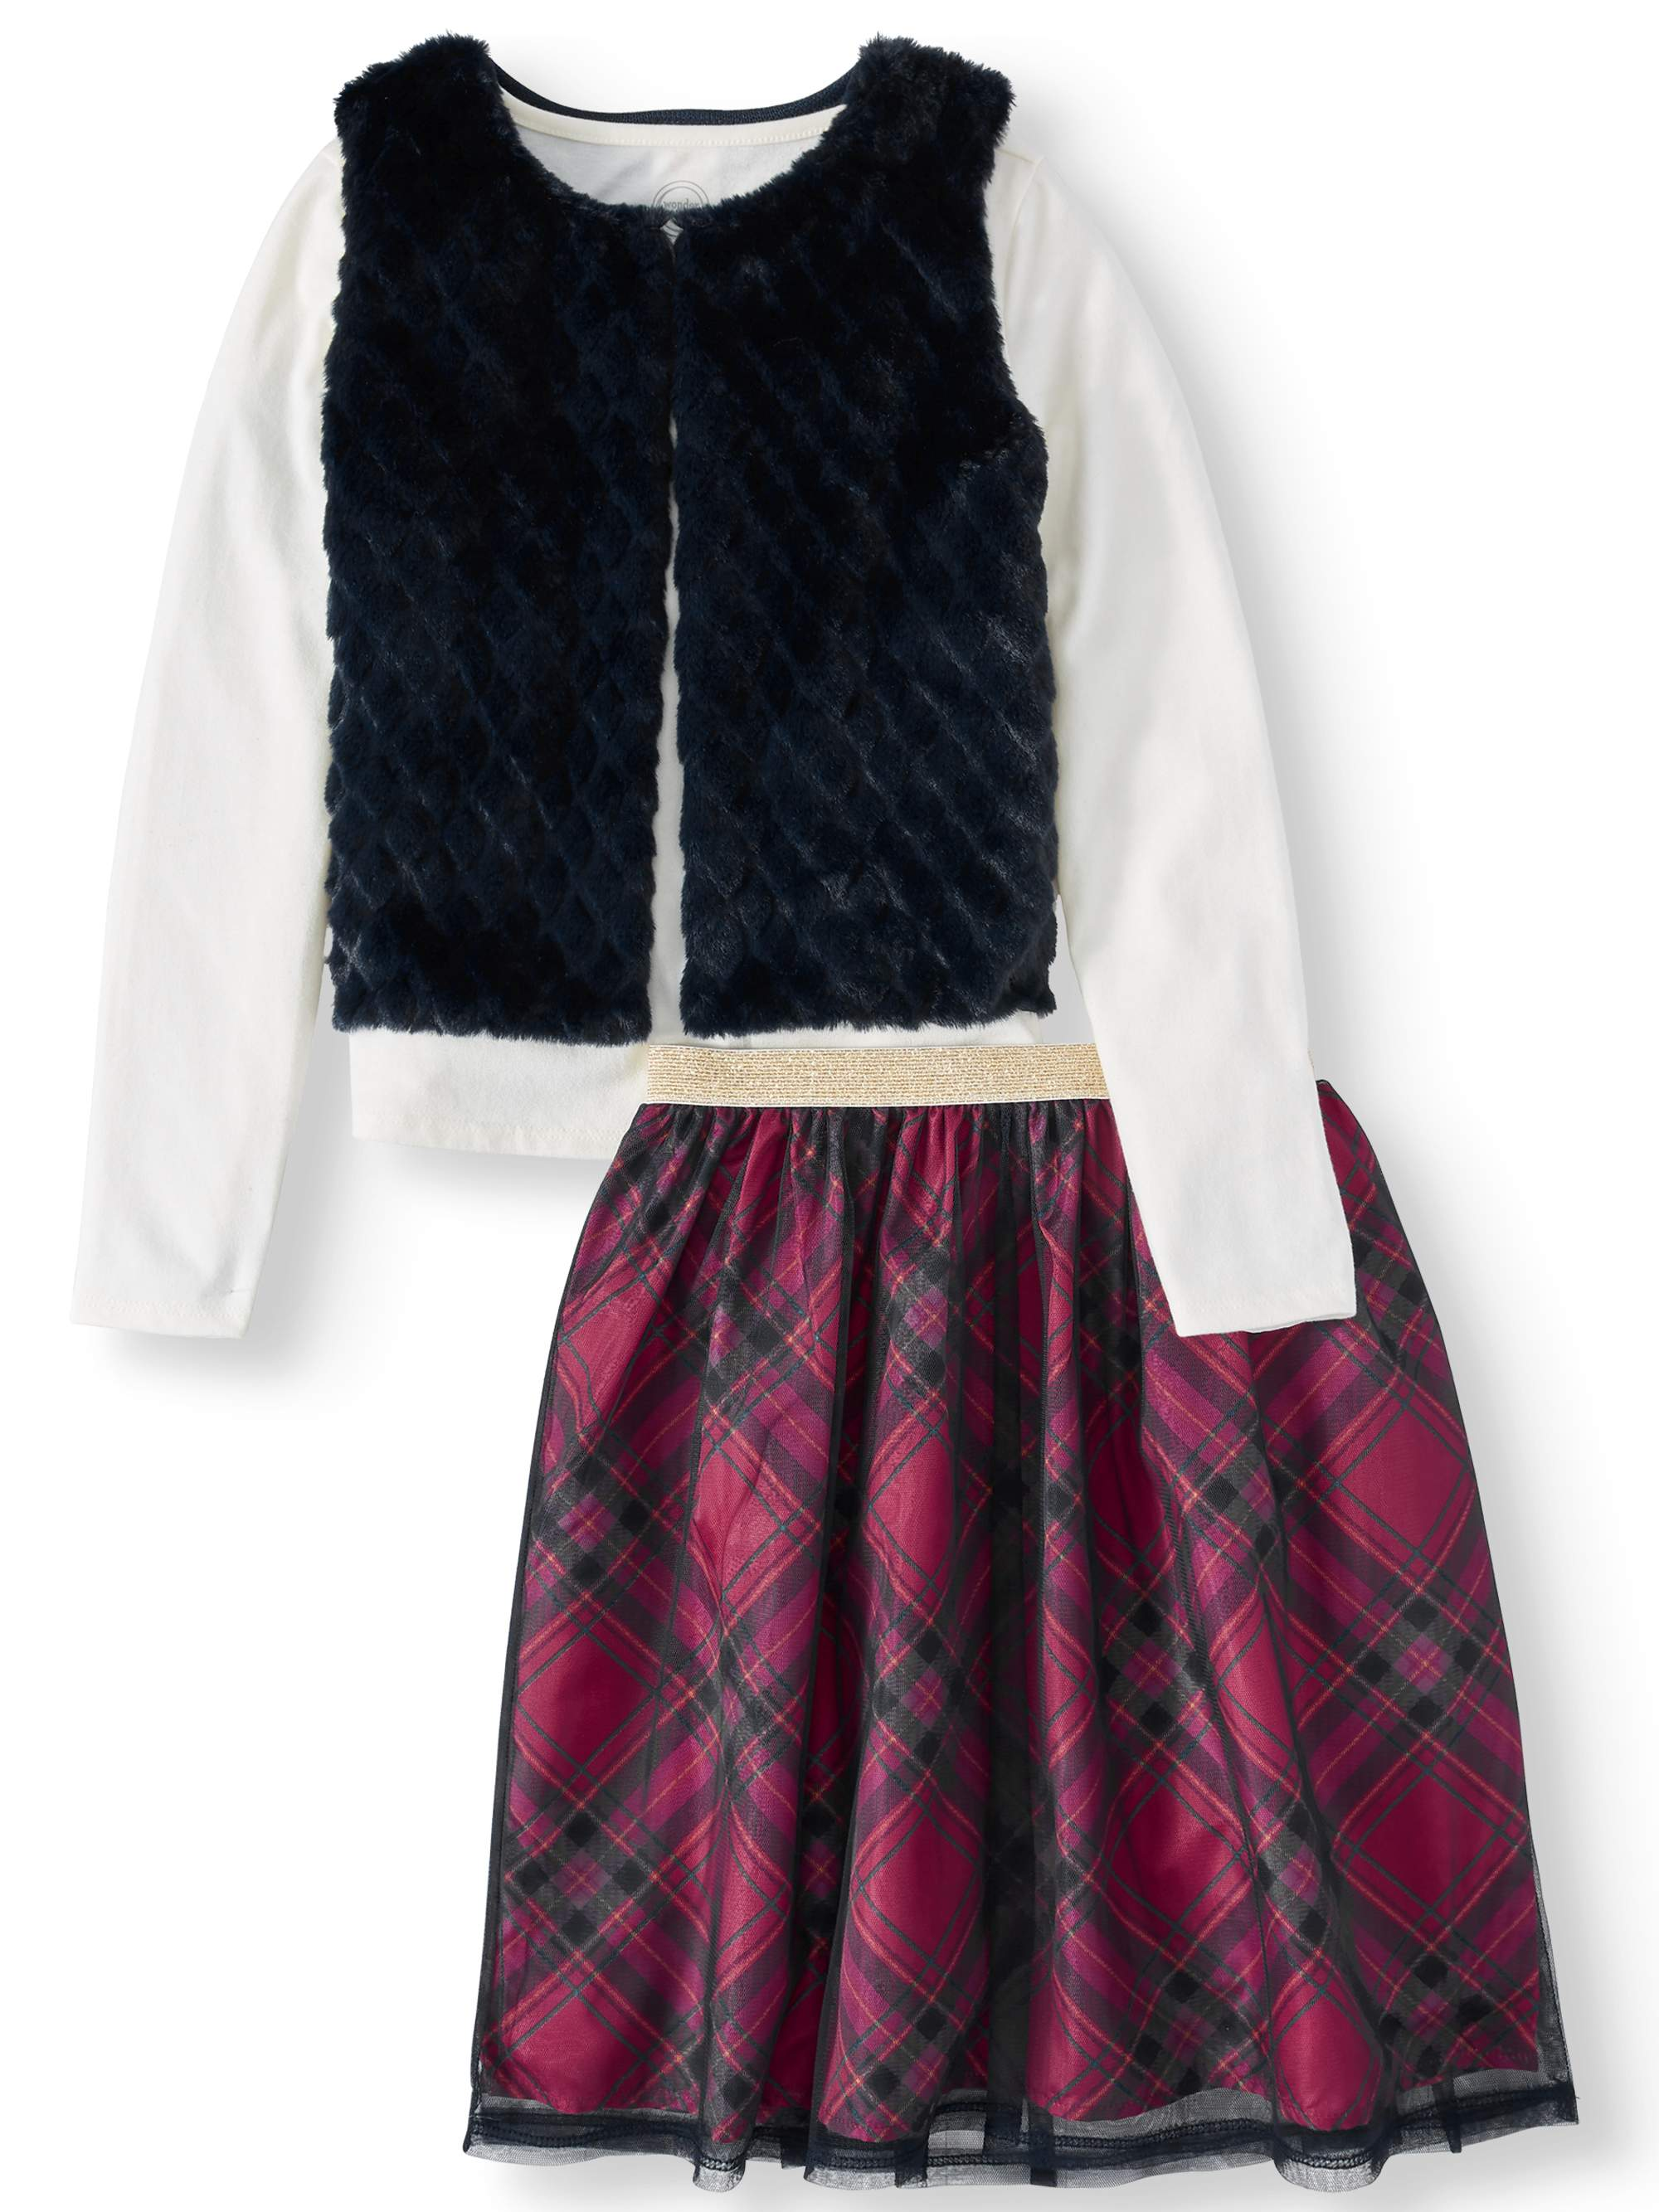 DESCENDANTS 3 Graphic Top and Tutu Skirt 2-Piece Outfit Set Little Girls /& Big Girls